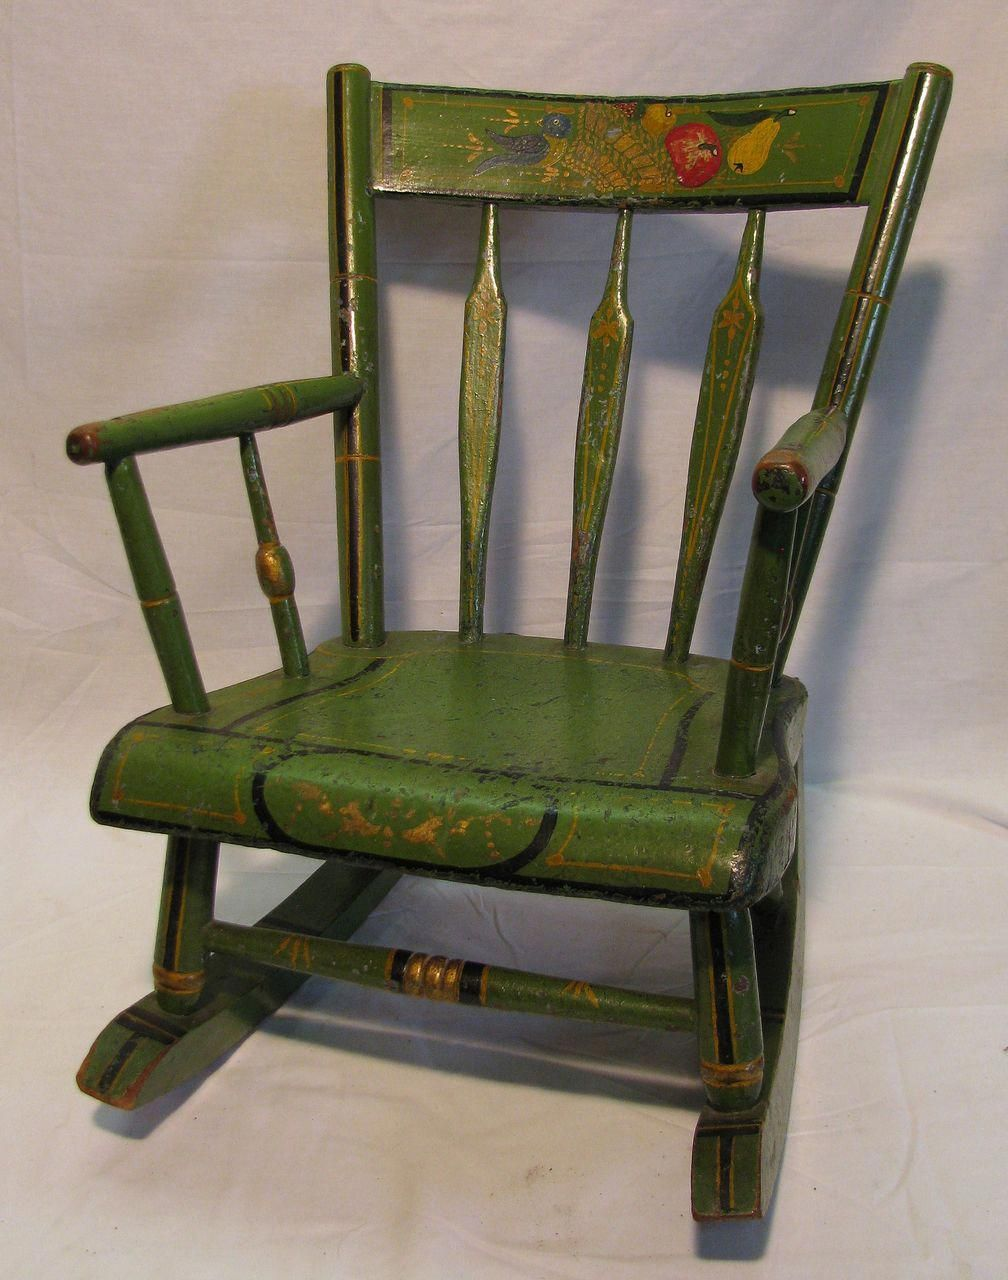 Antique Amish Green Folk Art Stenciled Child's Rocking Chair #childchair  Old Wooden Chairs, Antique - Antique Amish Green Folk Art Stenciled Child's Rocking Chair